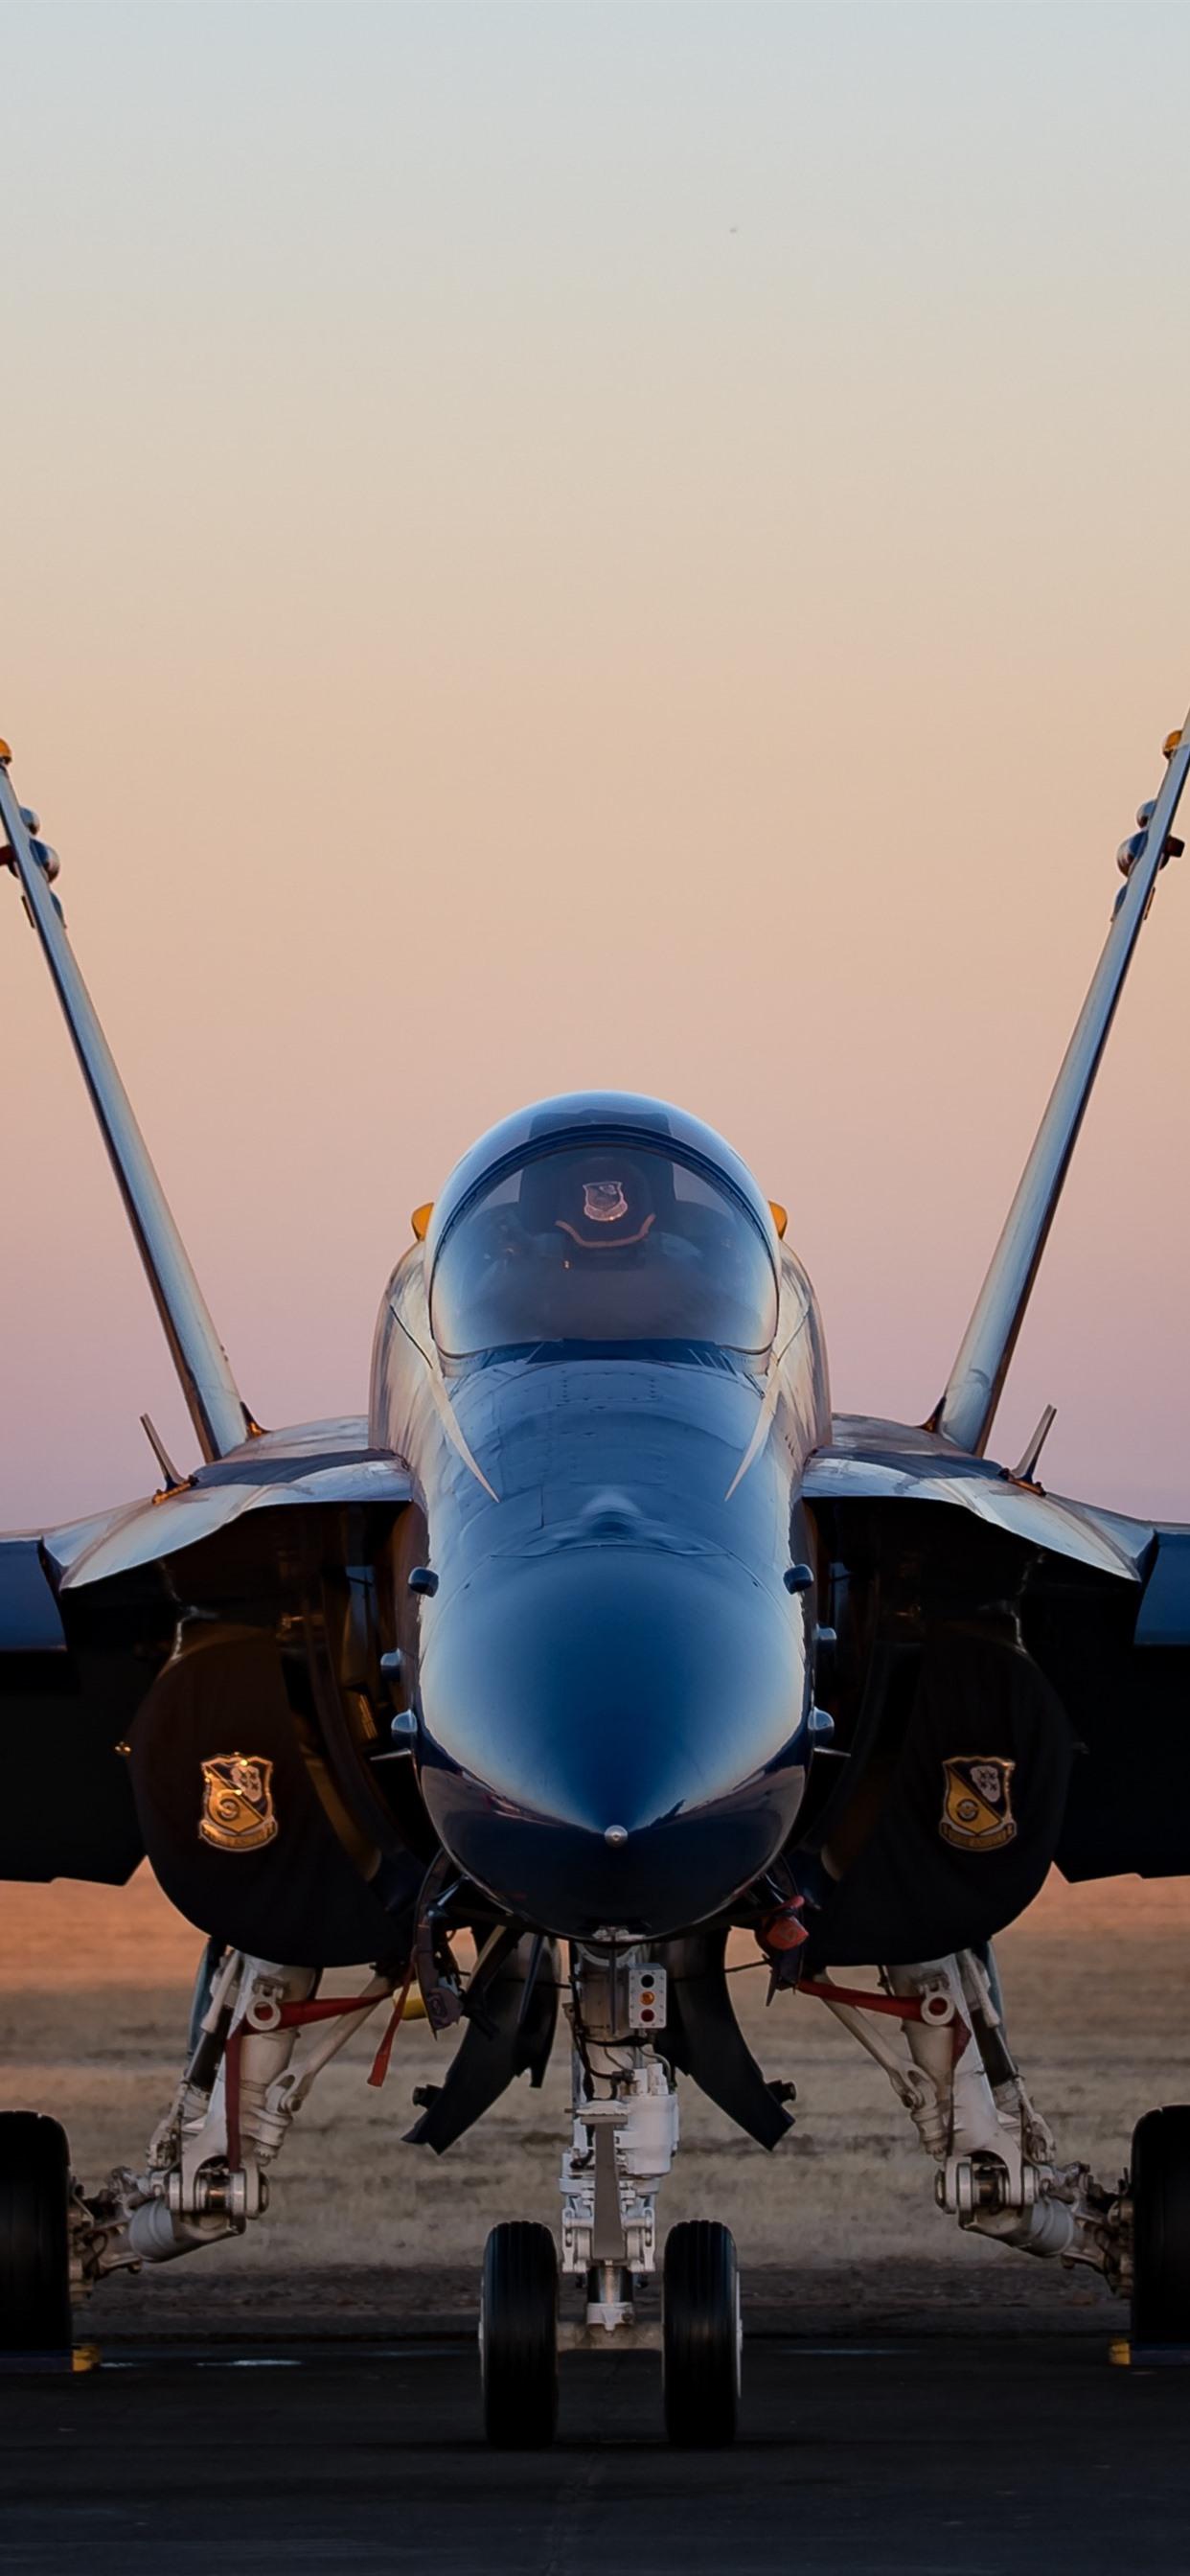 Wallpaper Hornet Cf 18 Fighter Front View 5120x2880 Uhd 5k